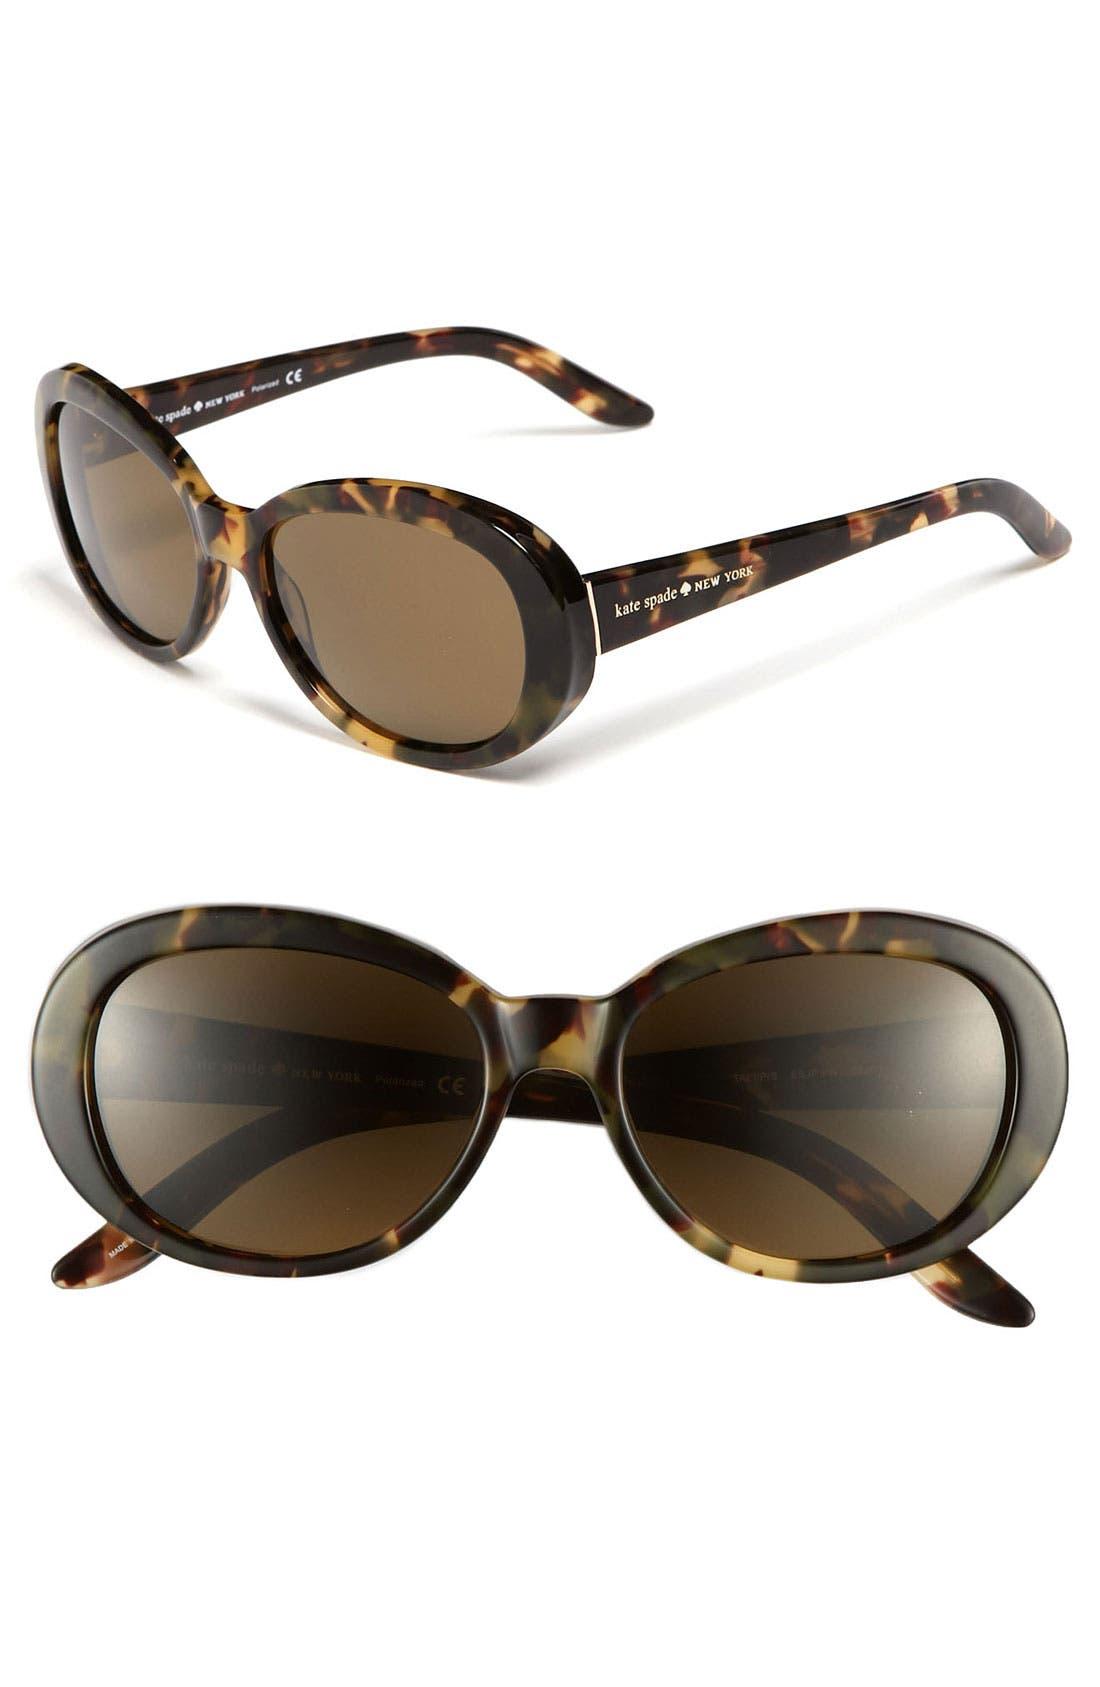 Main Image - kate spade new york 'tali' 53mm polarized sunglasses